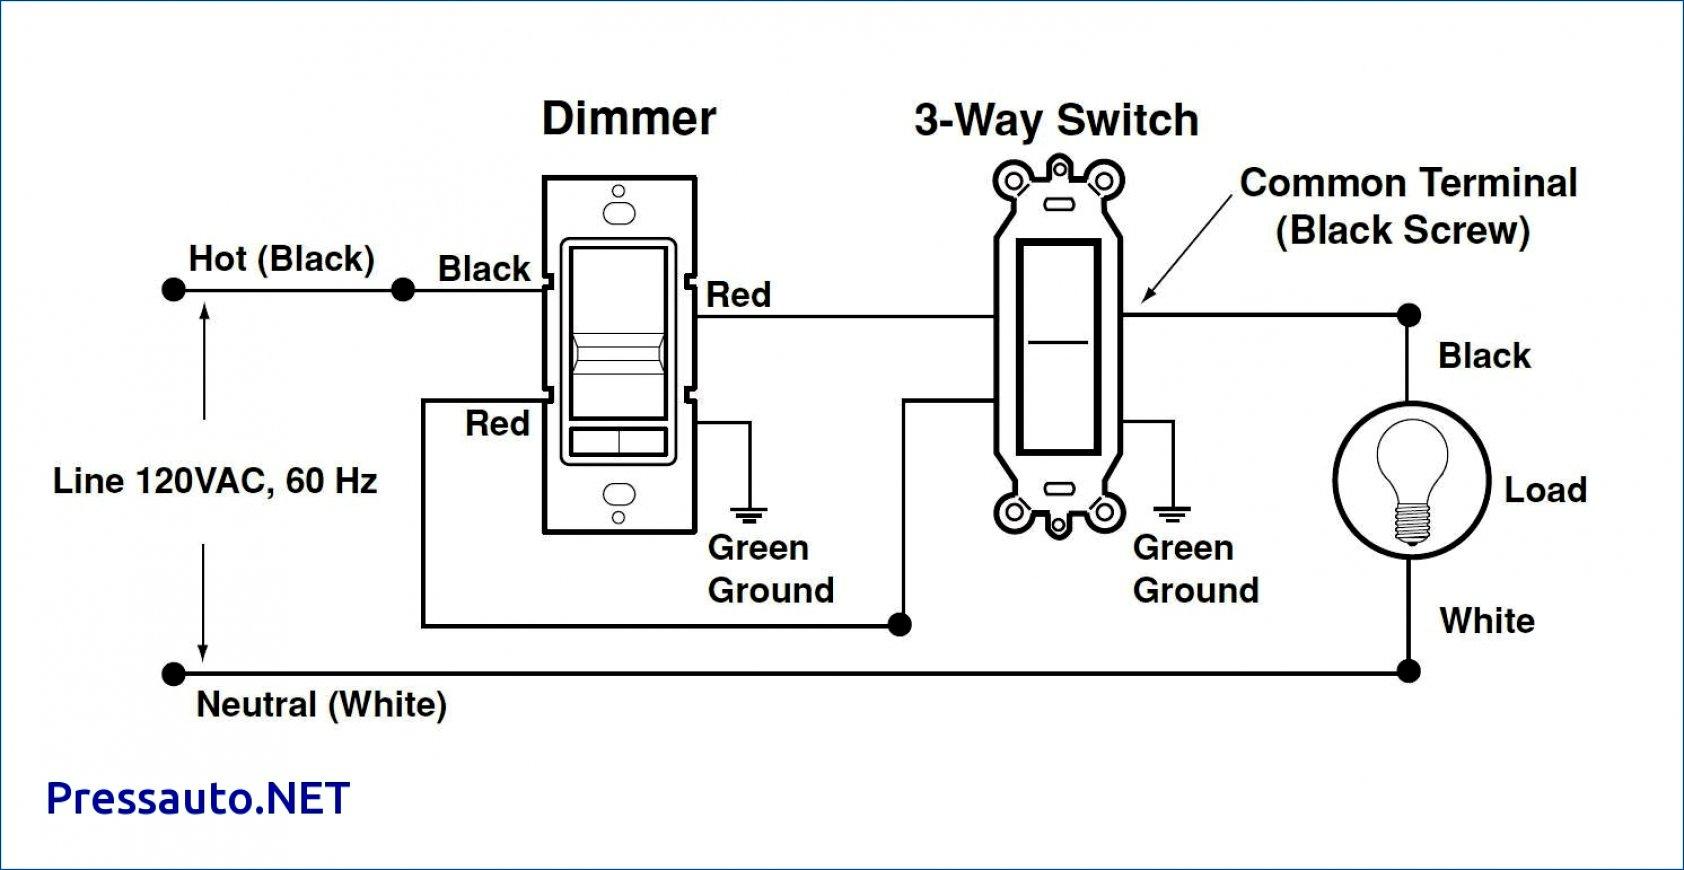 Blue Screw Lutron 3 Way Dimmer Switch Wiring Diagram | Wiring Diagram - Lutron 3 Way Dimmer Switch Wiring Diagram